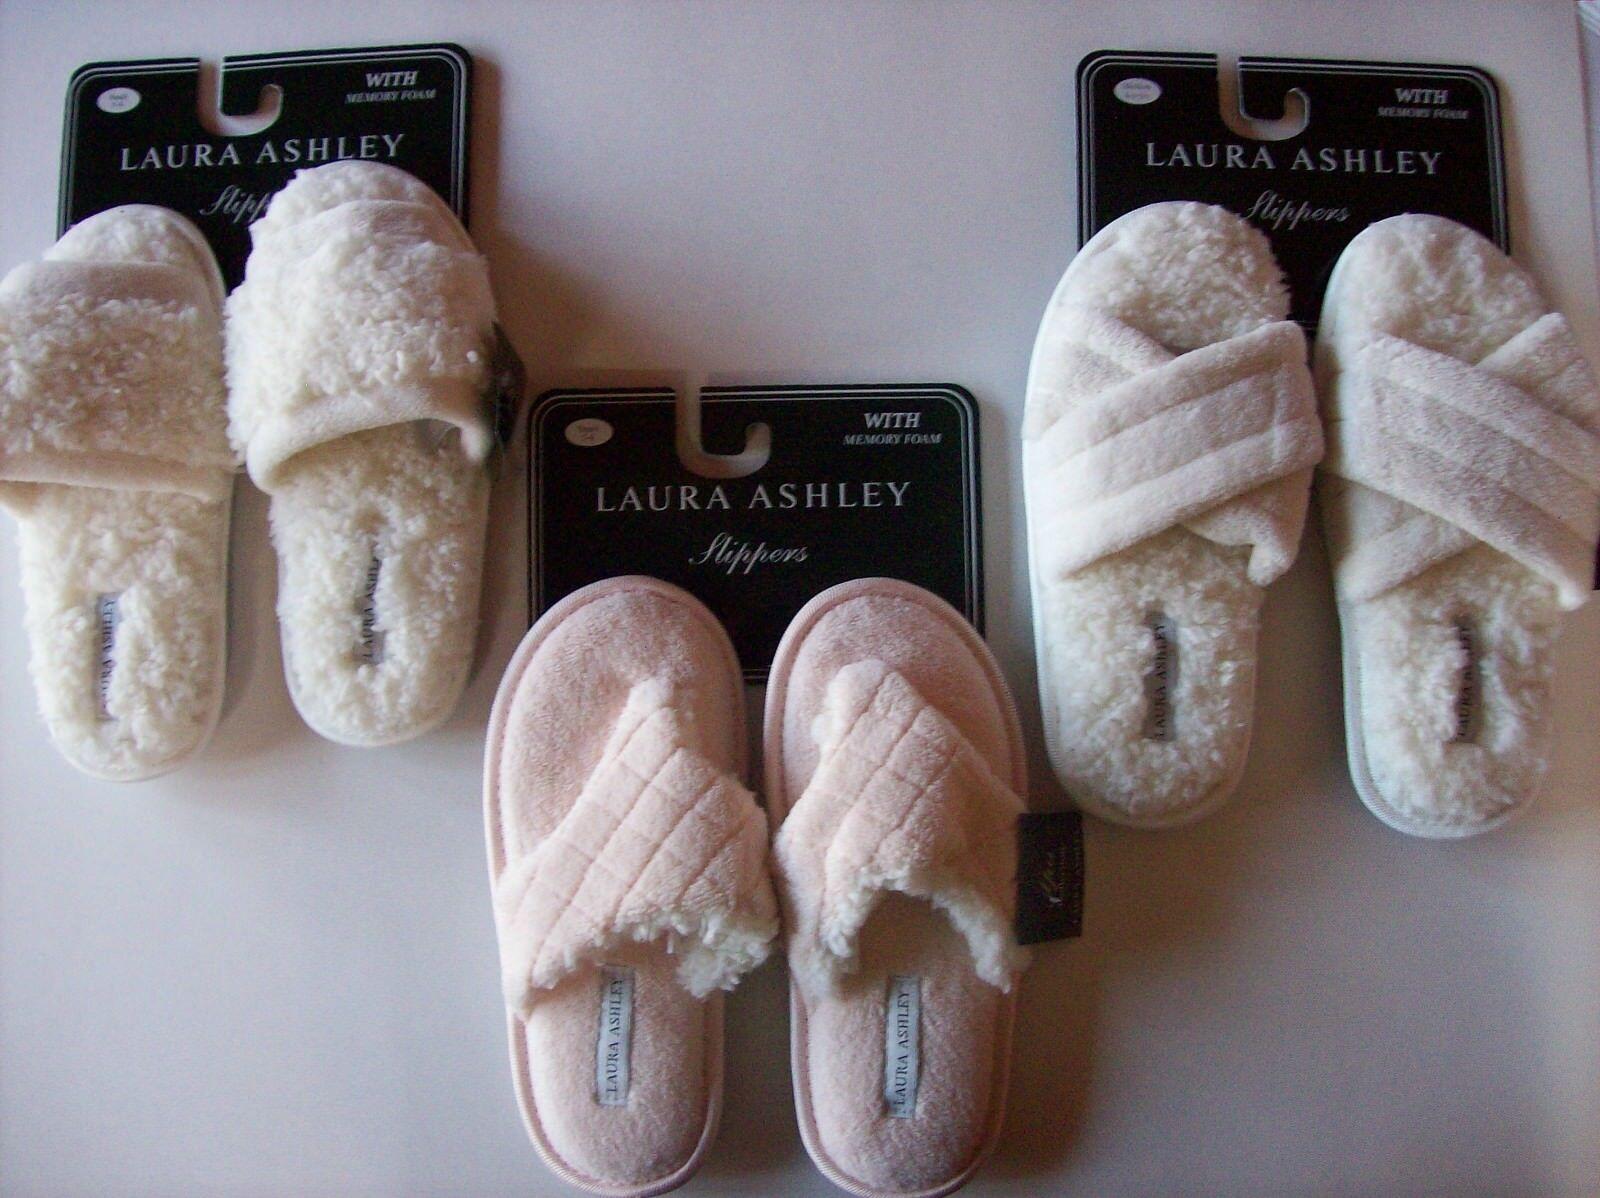 Laura Ashley Slippers Womens Plush Slide Cushioned Memory Foam Criss Cross Thong